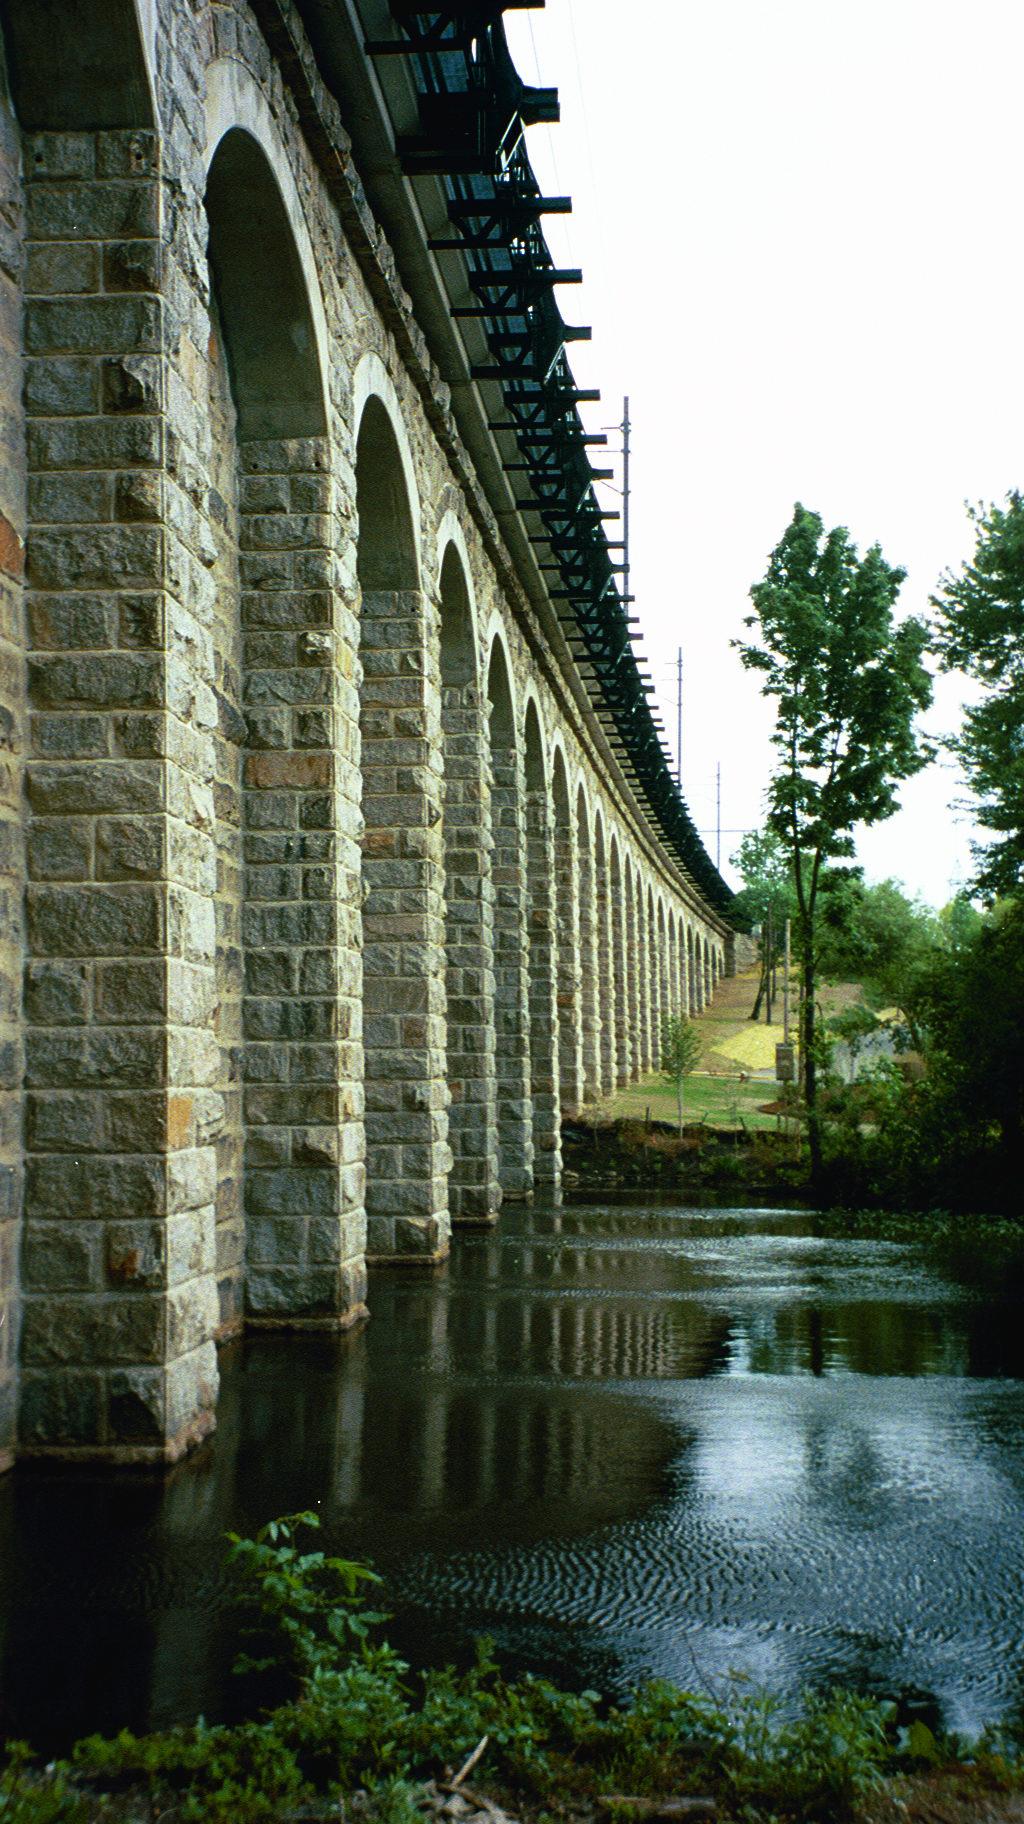 heantoniaduct,stillinusetodayontheortheastorridor,wasbuiltin1834